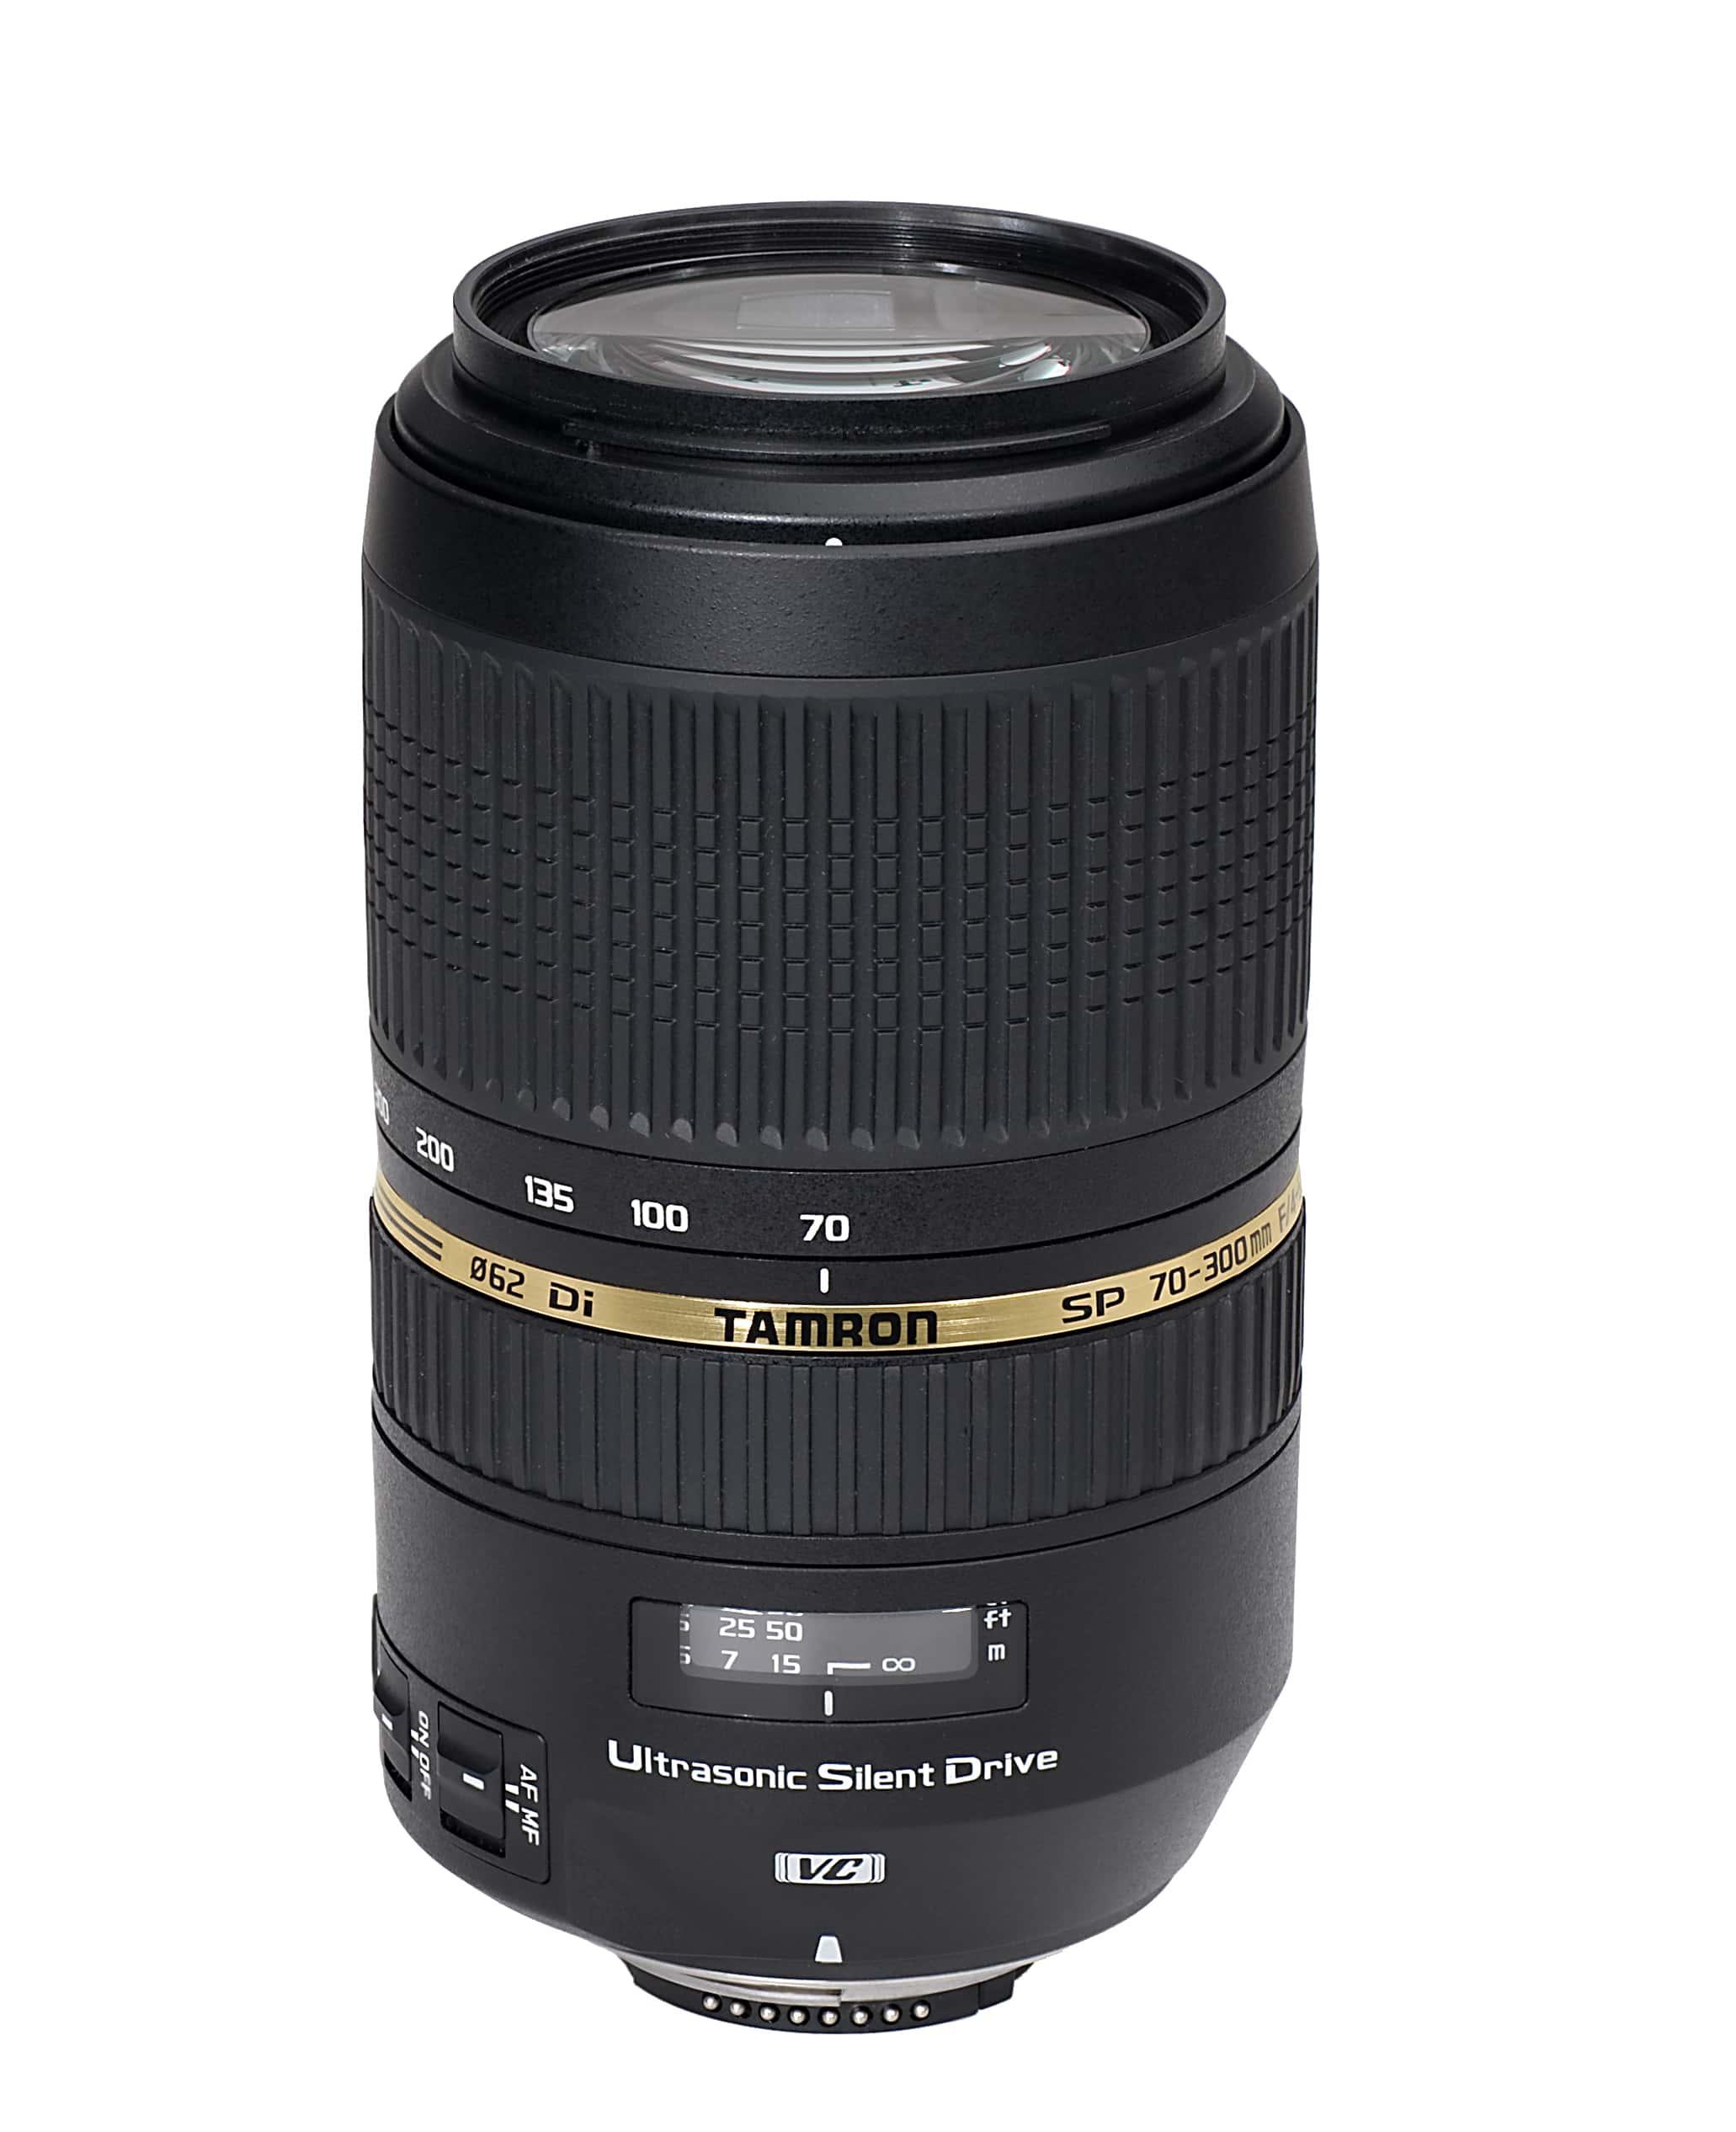 Tamron 70-300mm F/4,0-5,6 SP DI VC USD Nikon-Anschluss Zoomobjektiv für 329,00 Euro